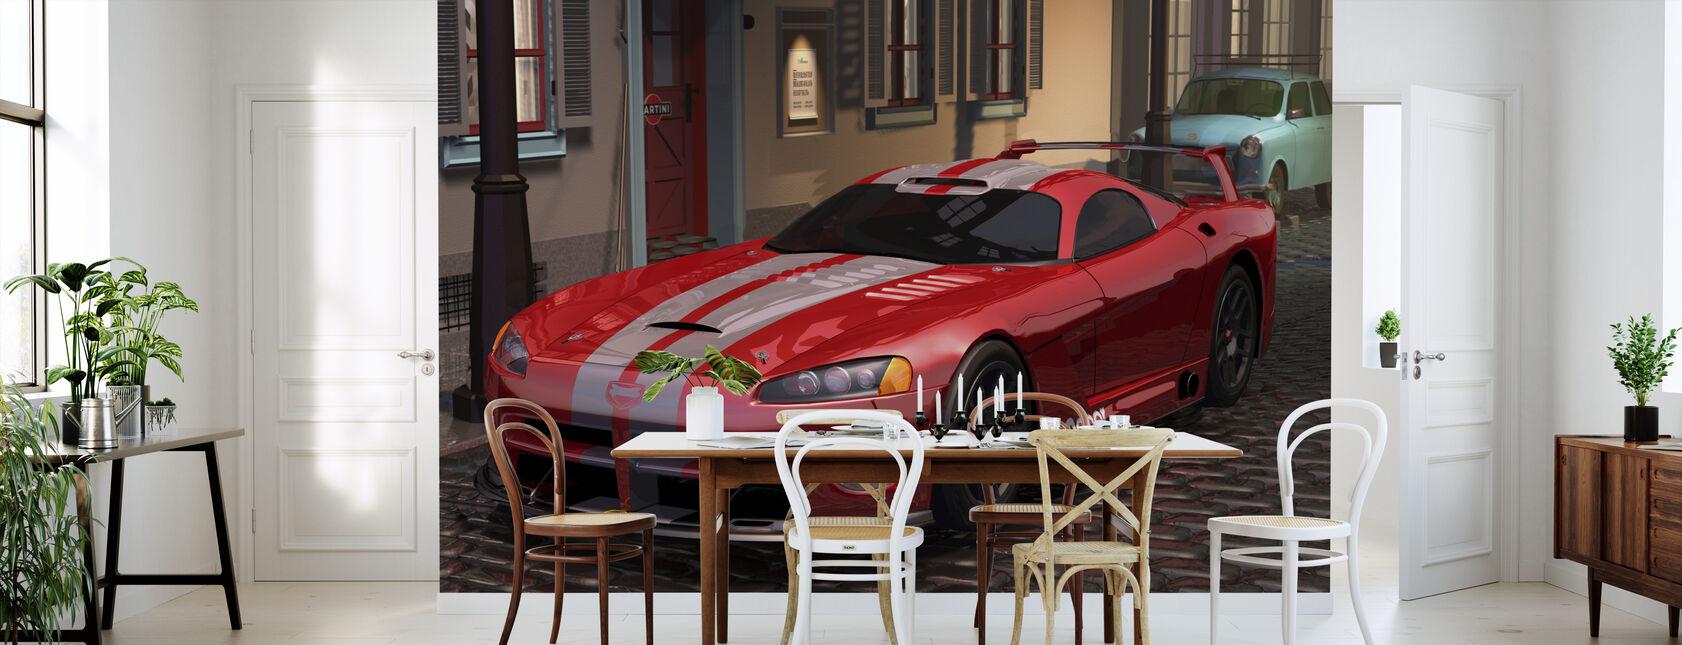 Red Fast Car - Wallpaper - Kitchen